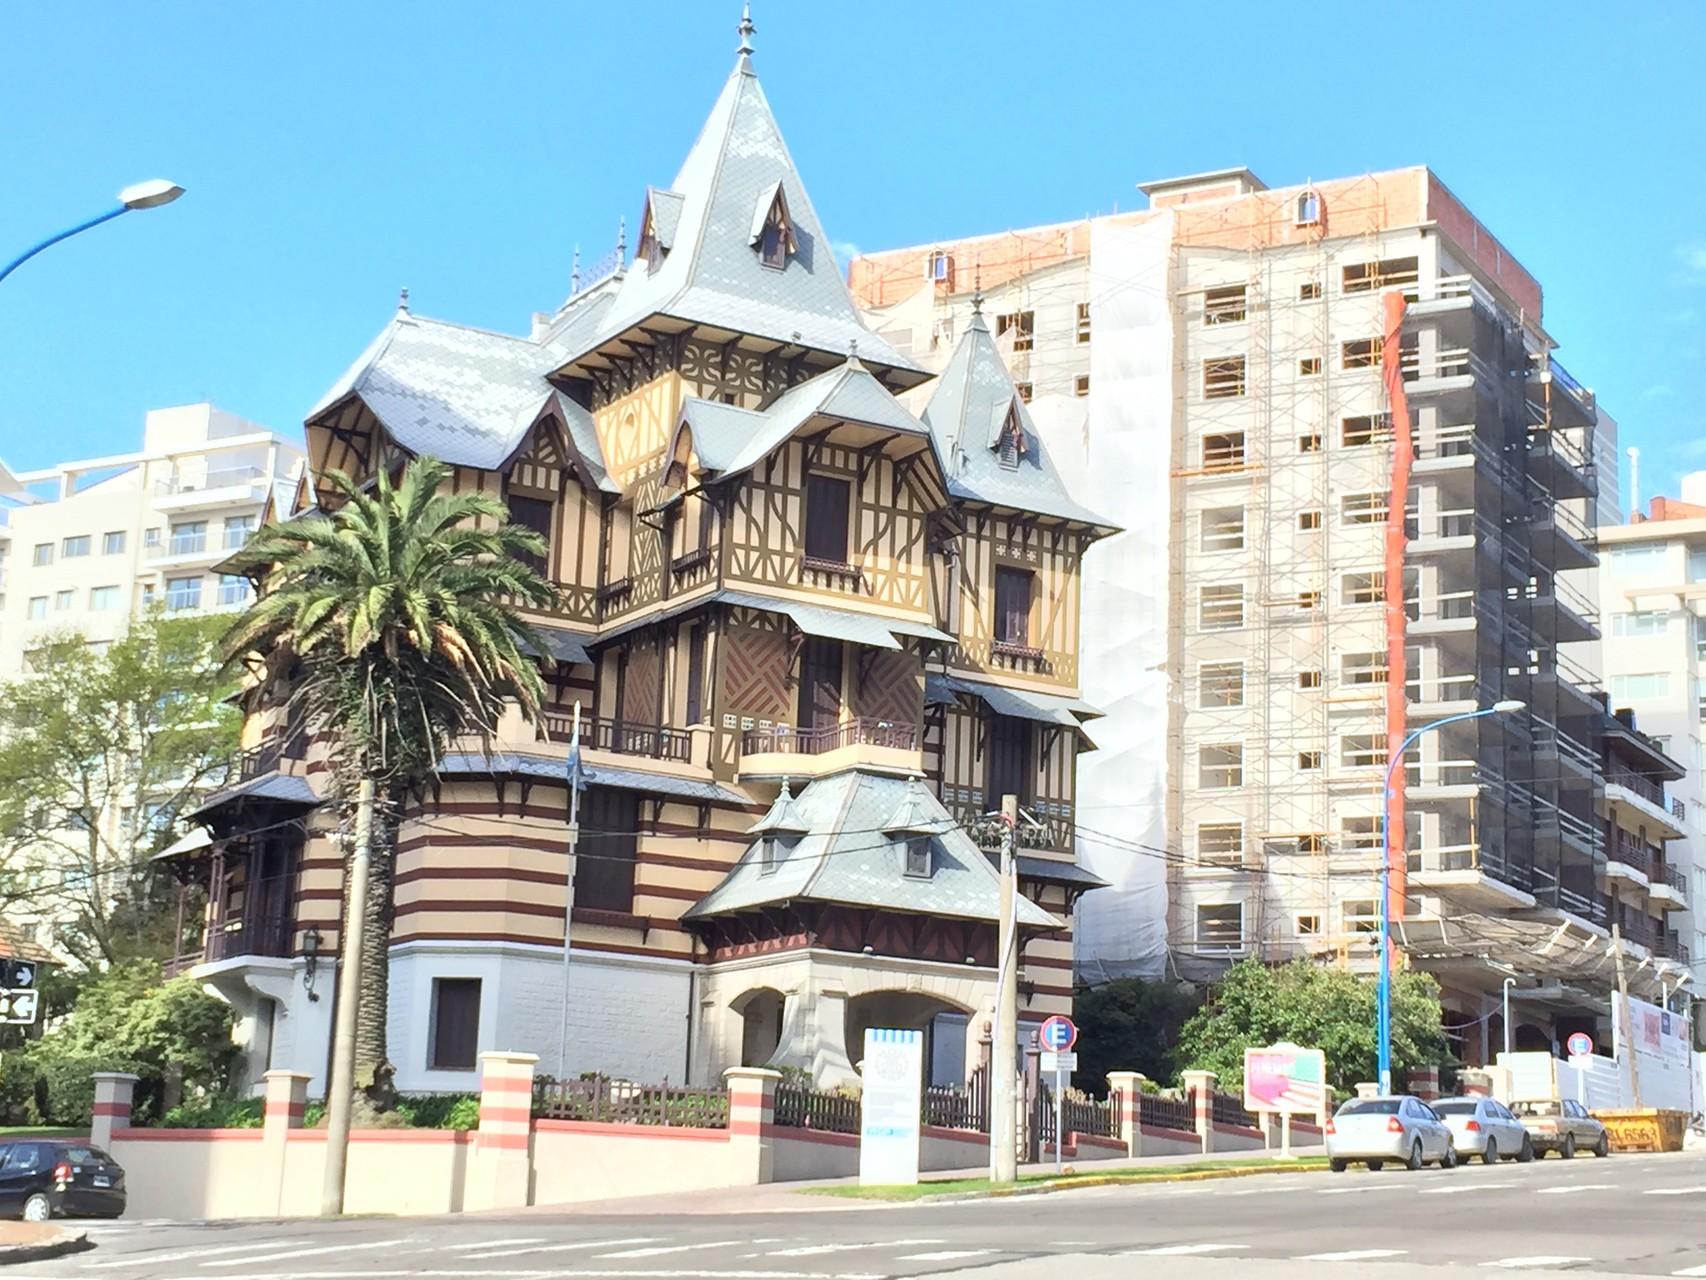 Altes Haus in Bahaia Blanca